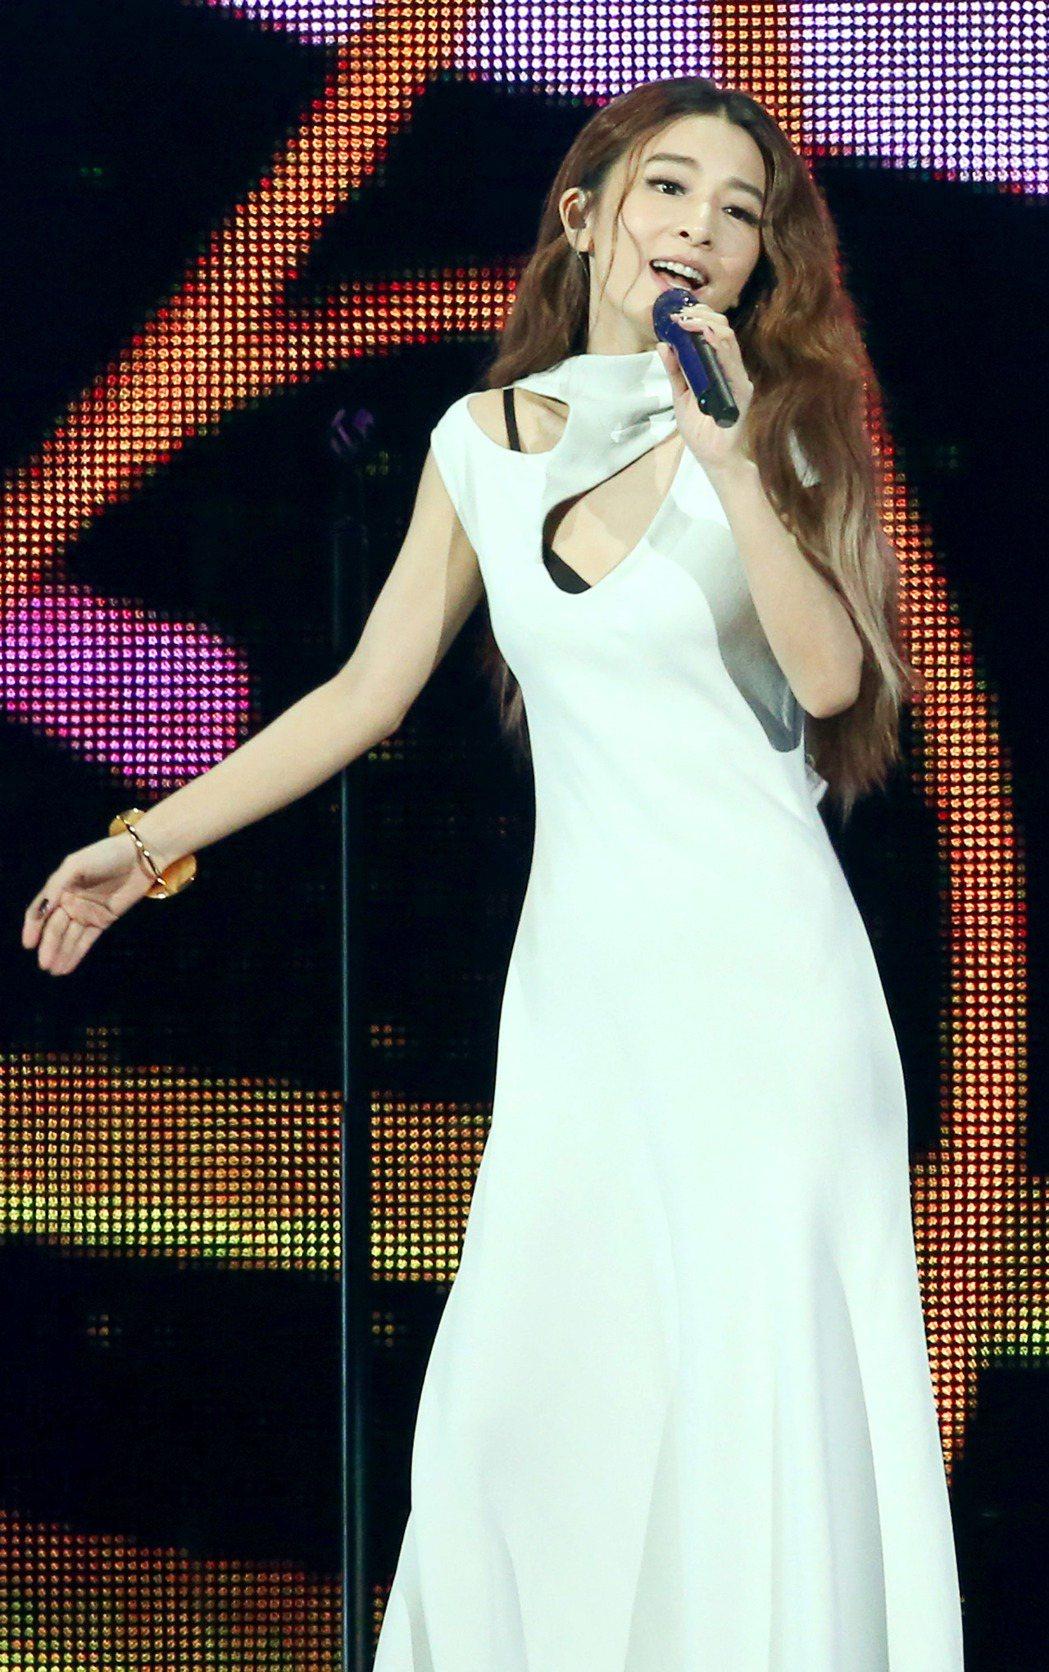 KKBOX風雲榜在台北小巨蛋舉行,田馥甄首先小露性感登場演唱「小幸運」等歌曲。記...